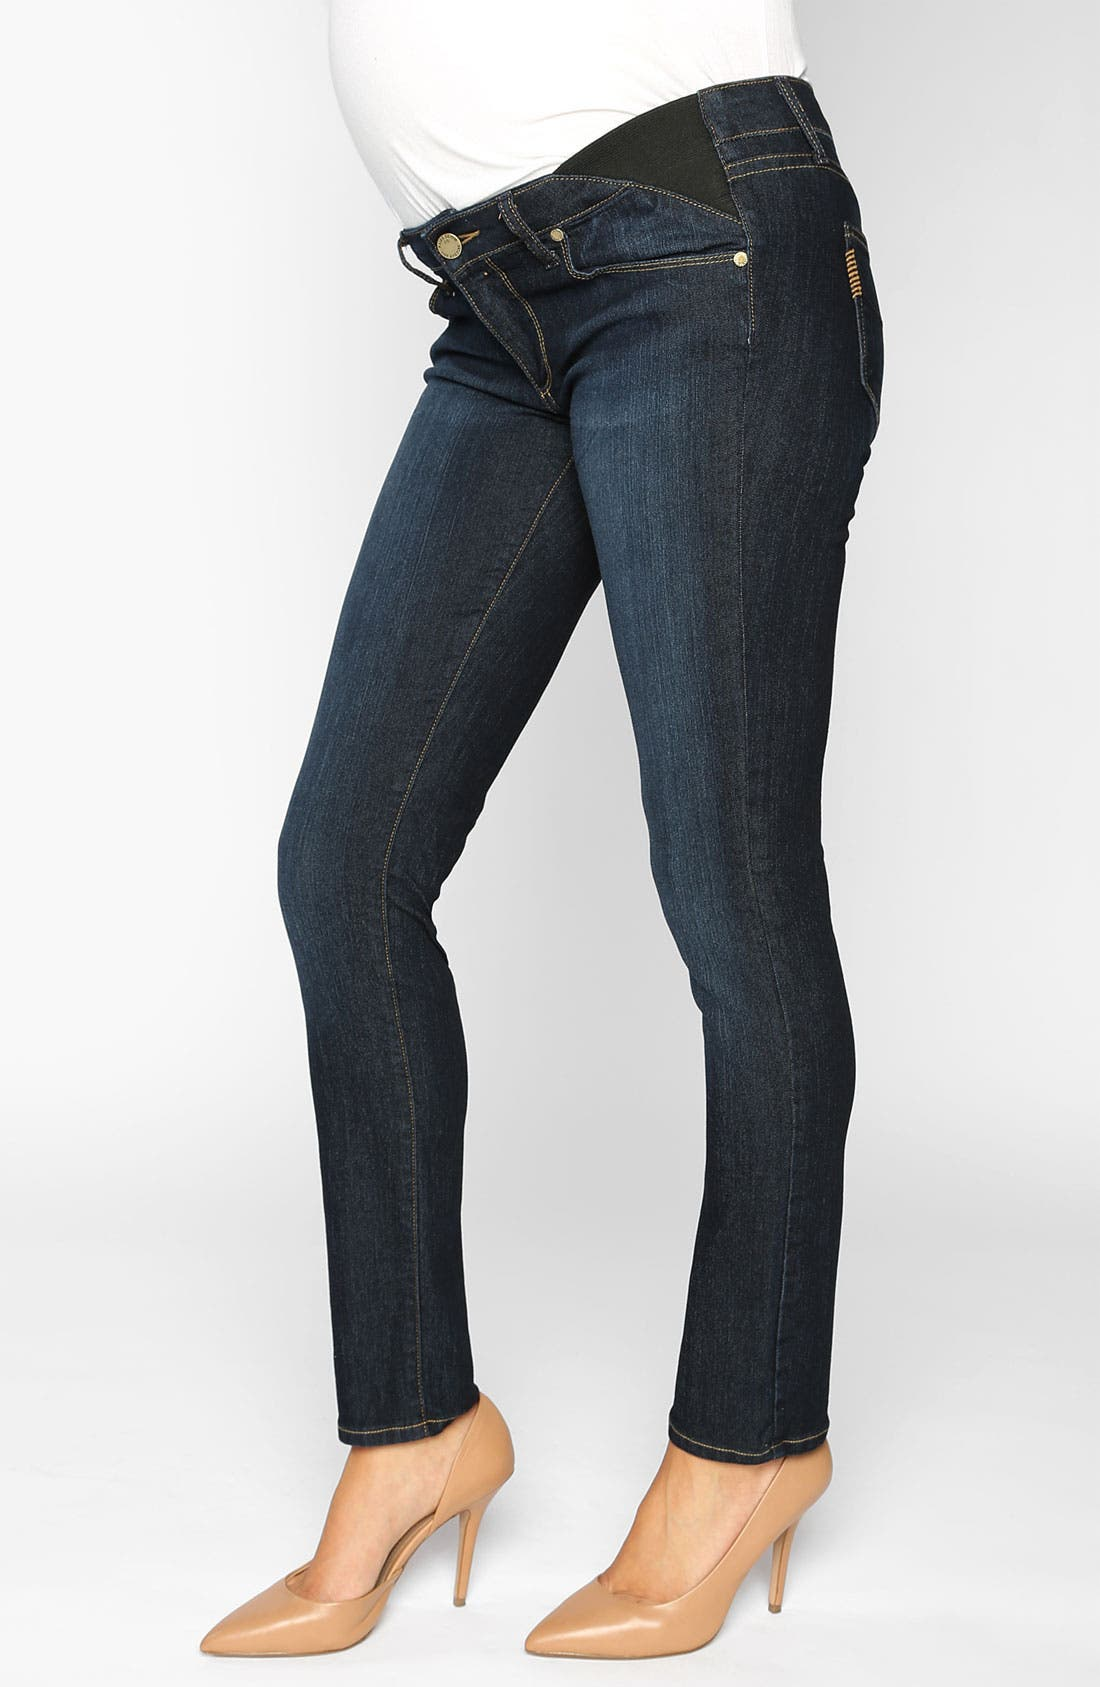 Main Image - Paige Denim 'Skyline' Maternity Skinny Jeans (Carson)